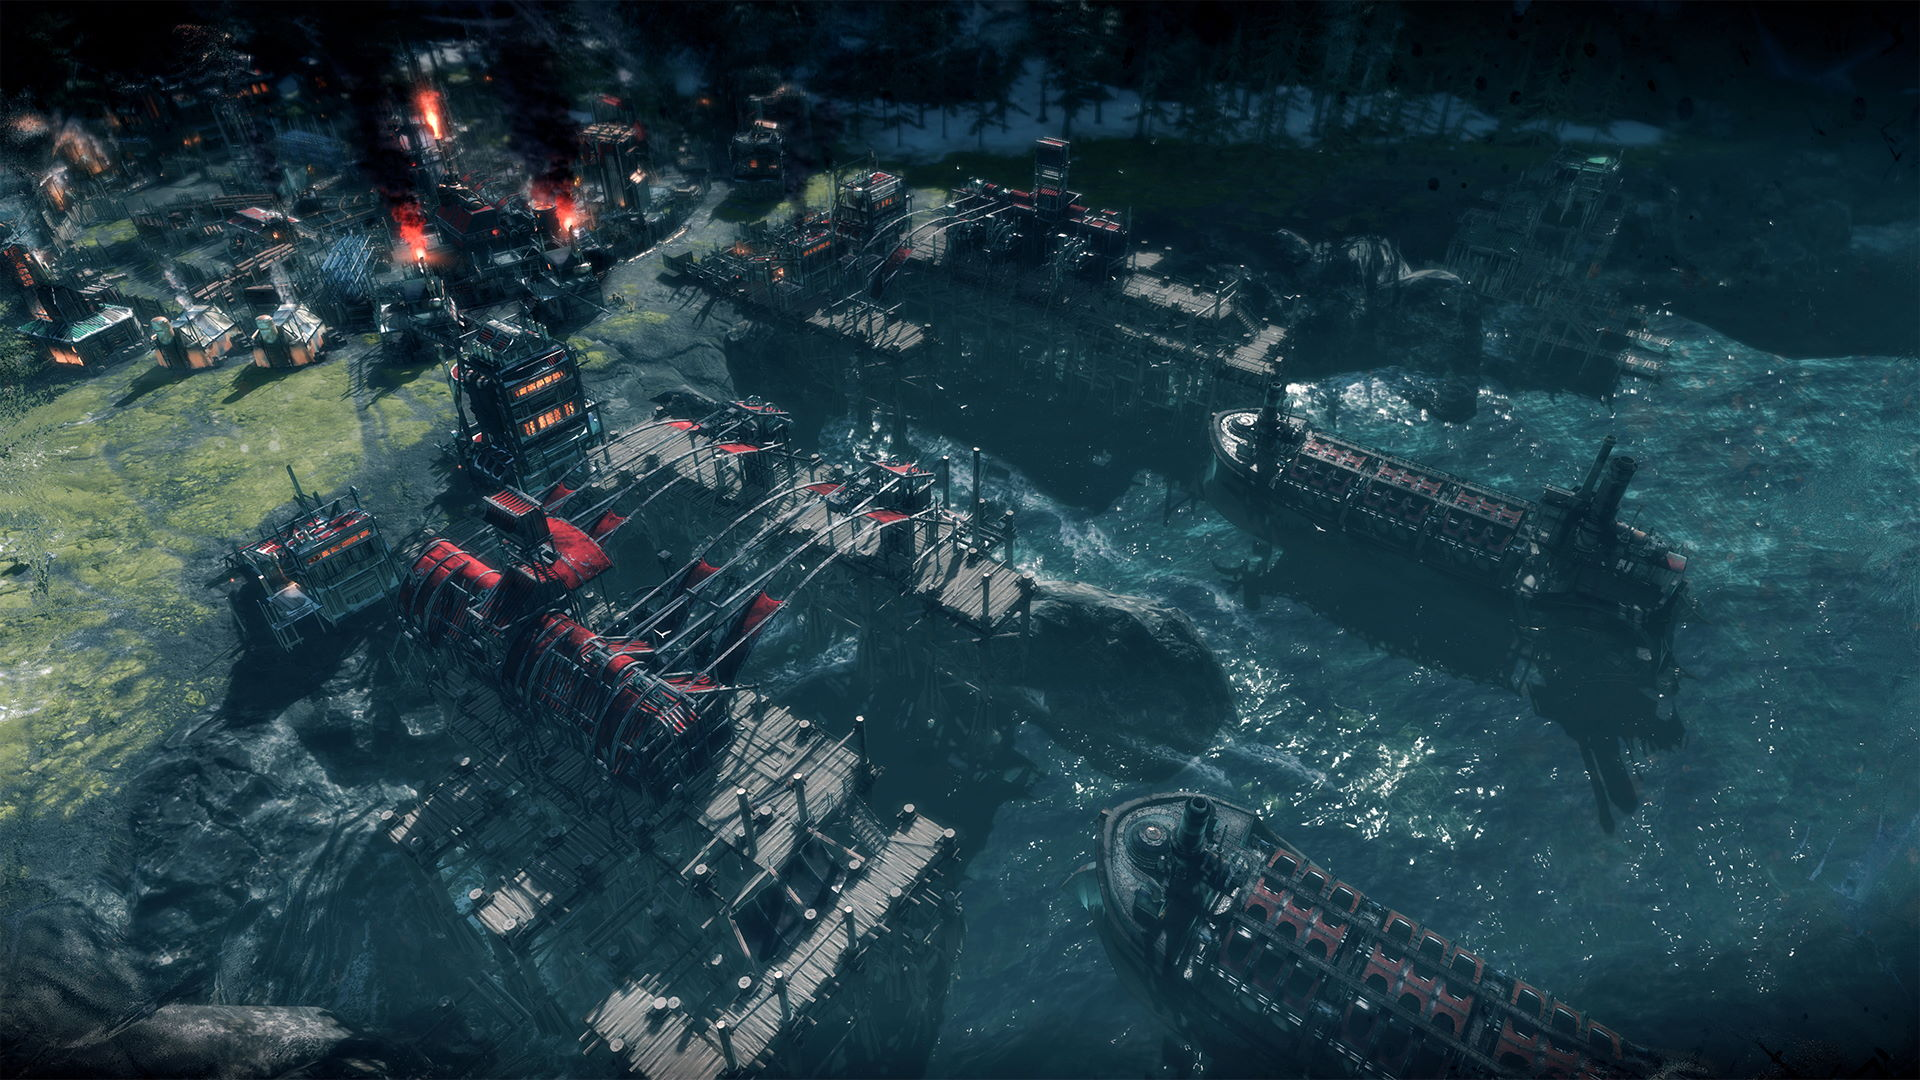 Frostpunk - The Last Autumn screenshot